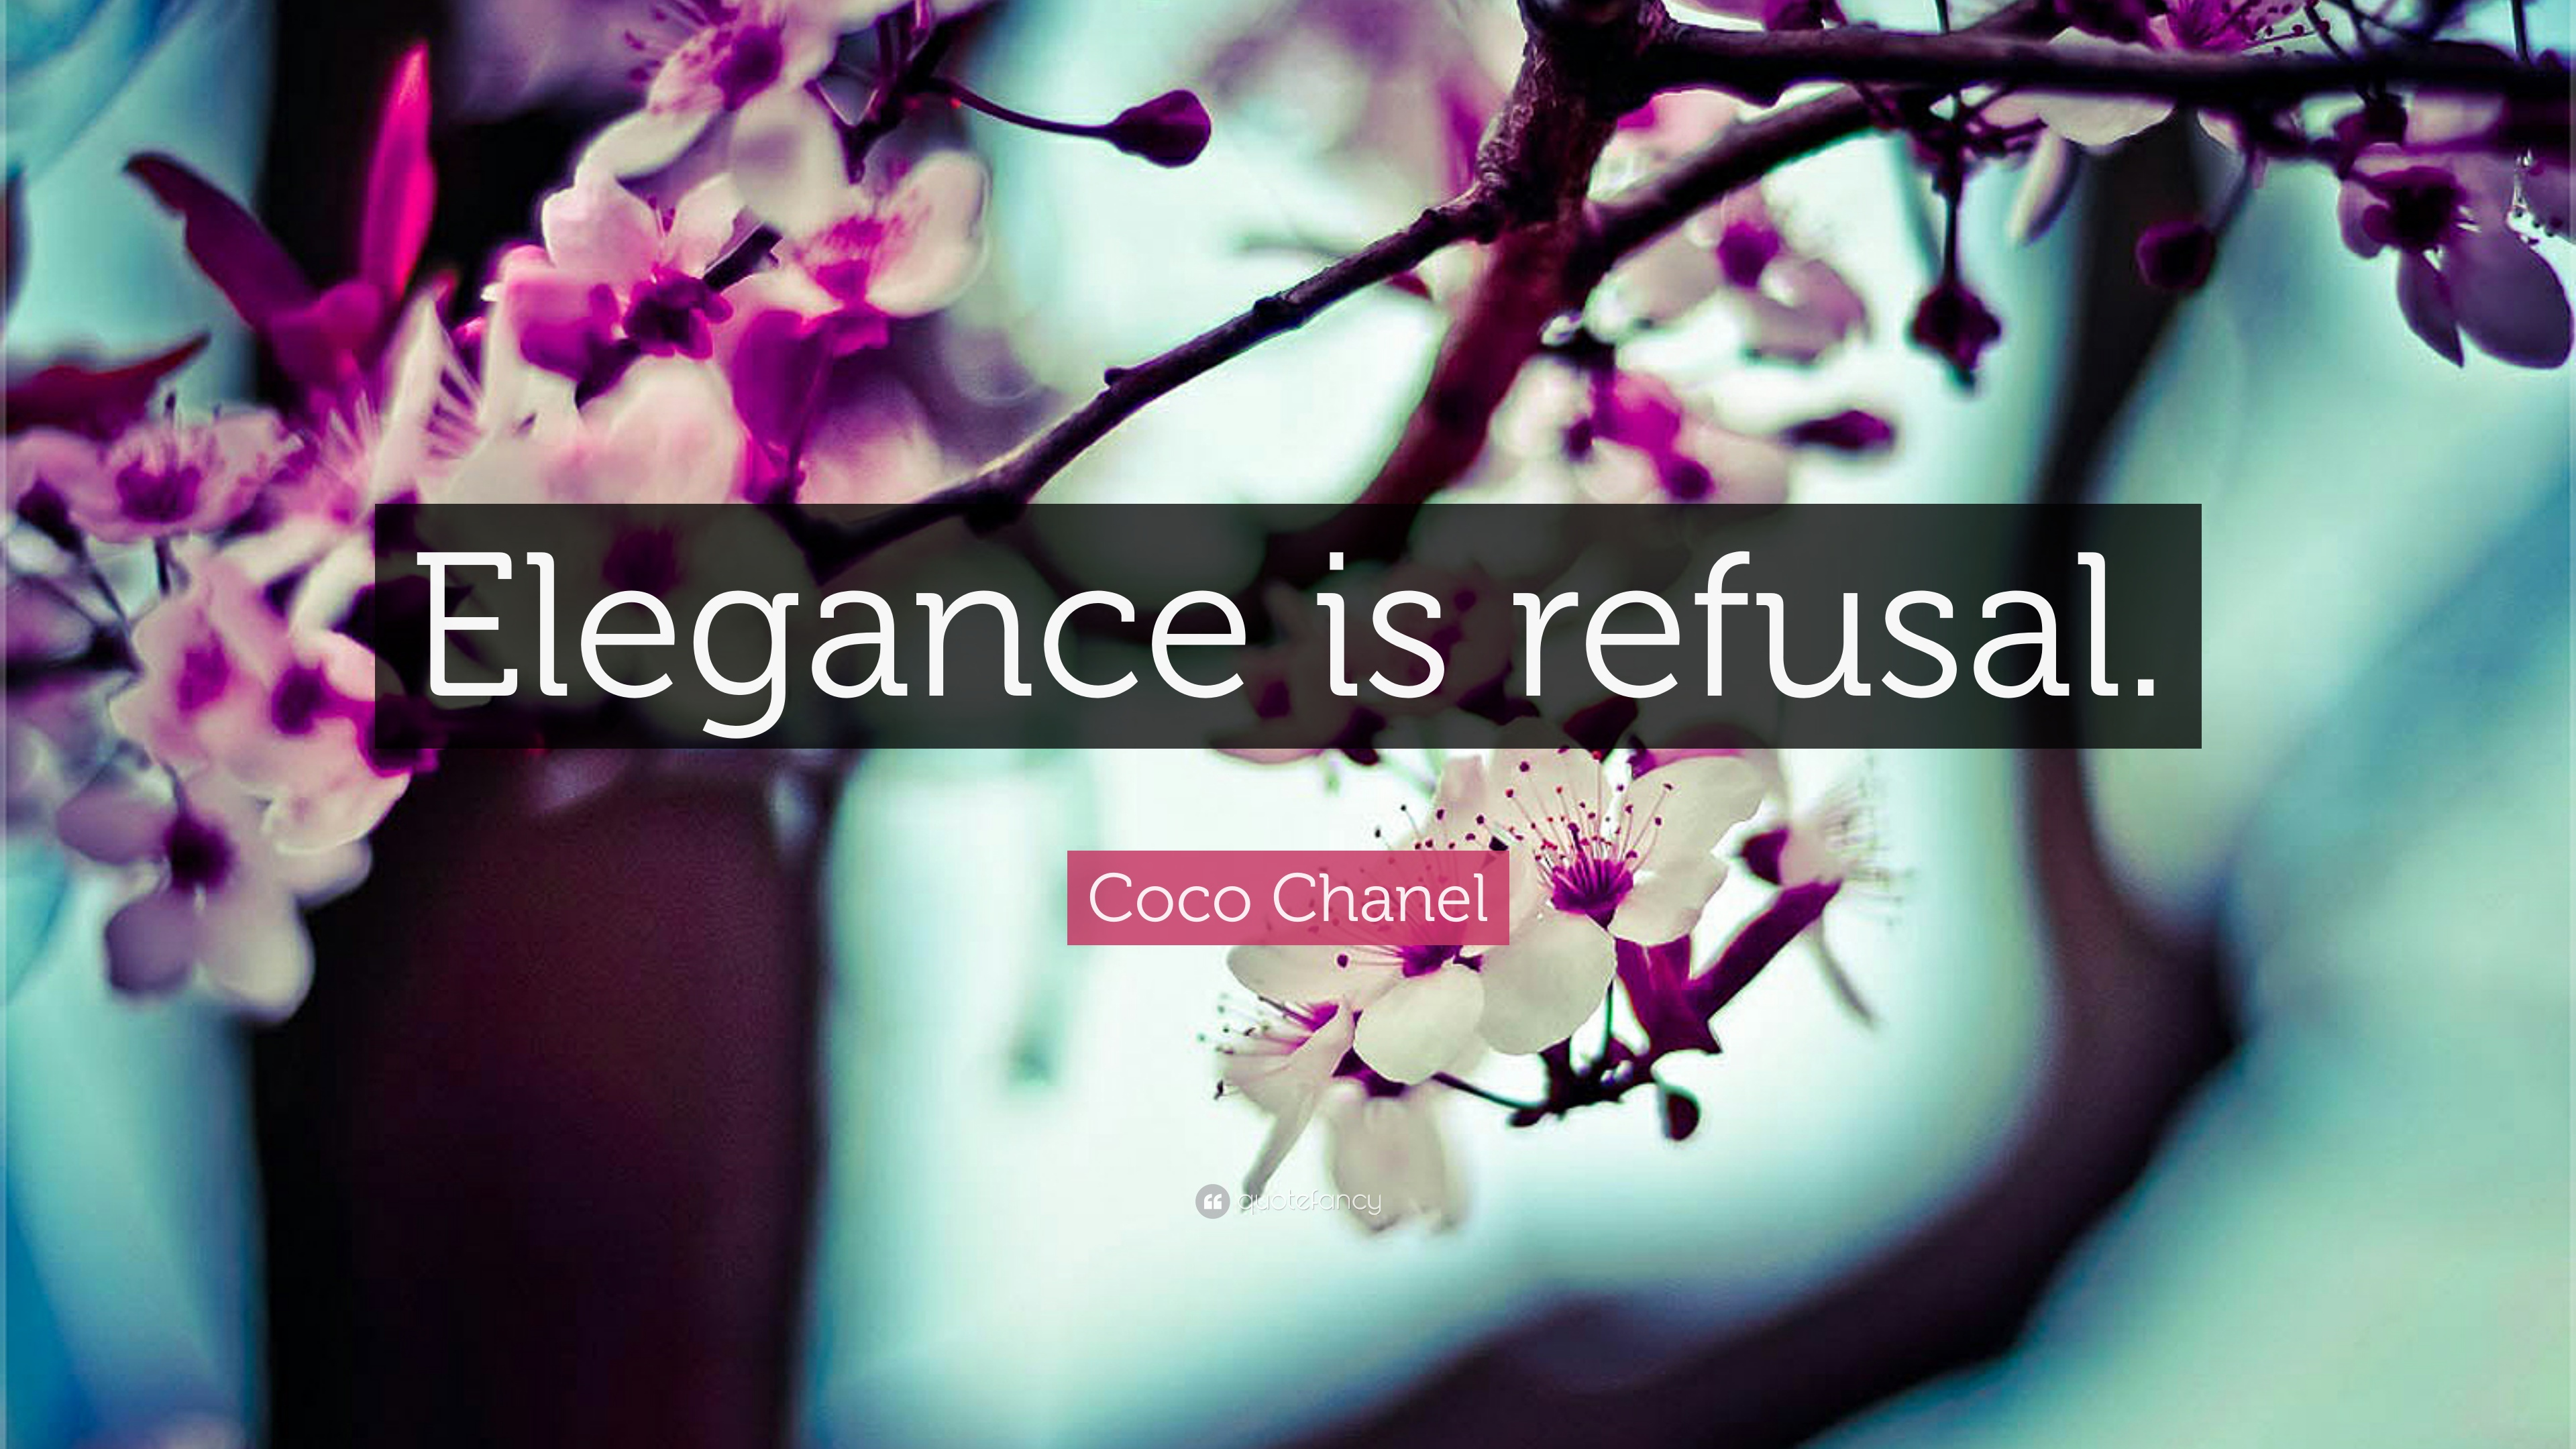 Coco chanel quote elegance is refusal 15 wallpapers - Coco chanel desktop wallpaper ...